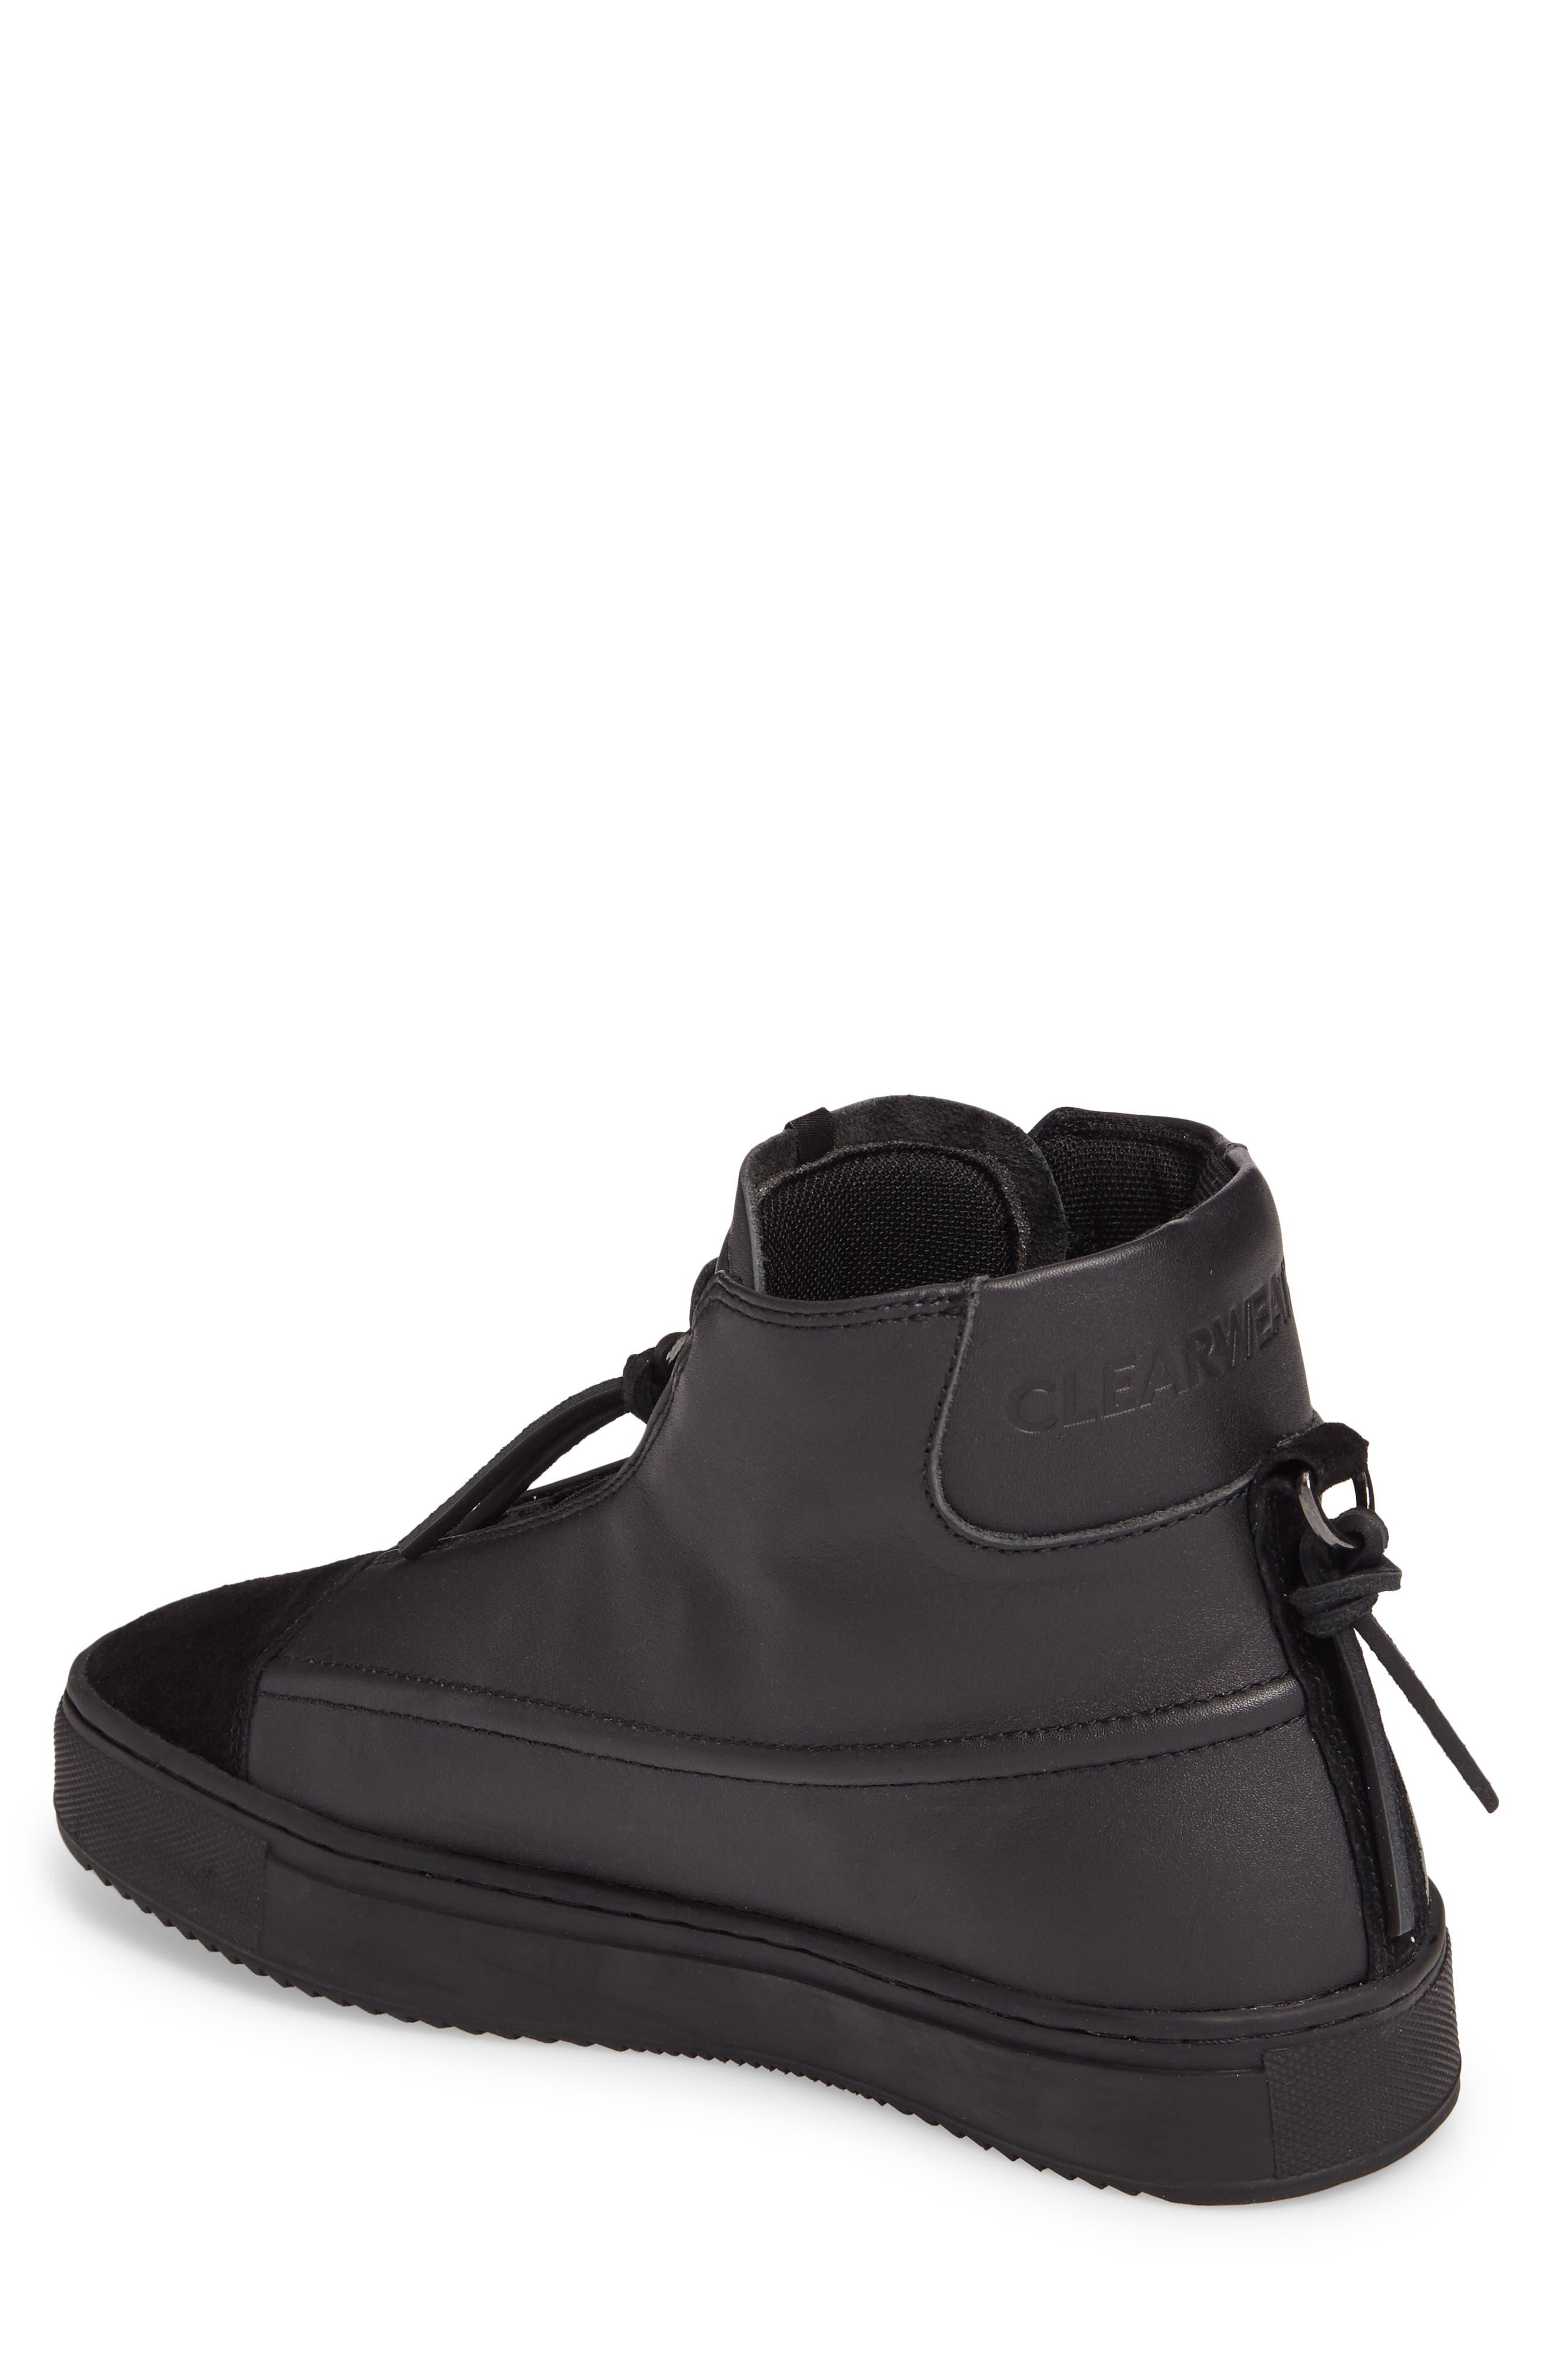 Sidney High Top Sneaker,                             Alternate thumbnail 2, color,                             001